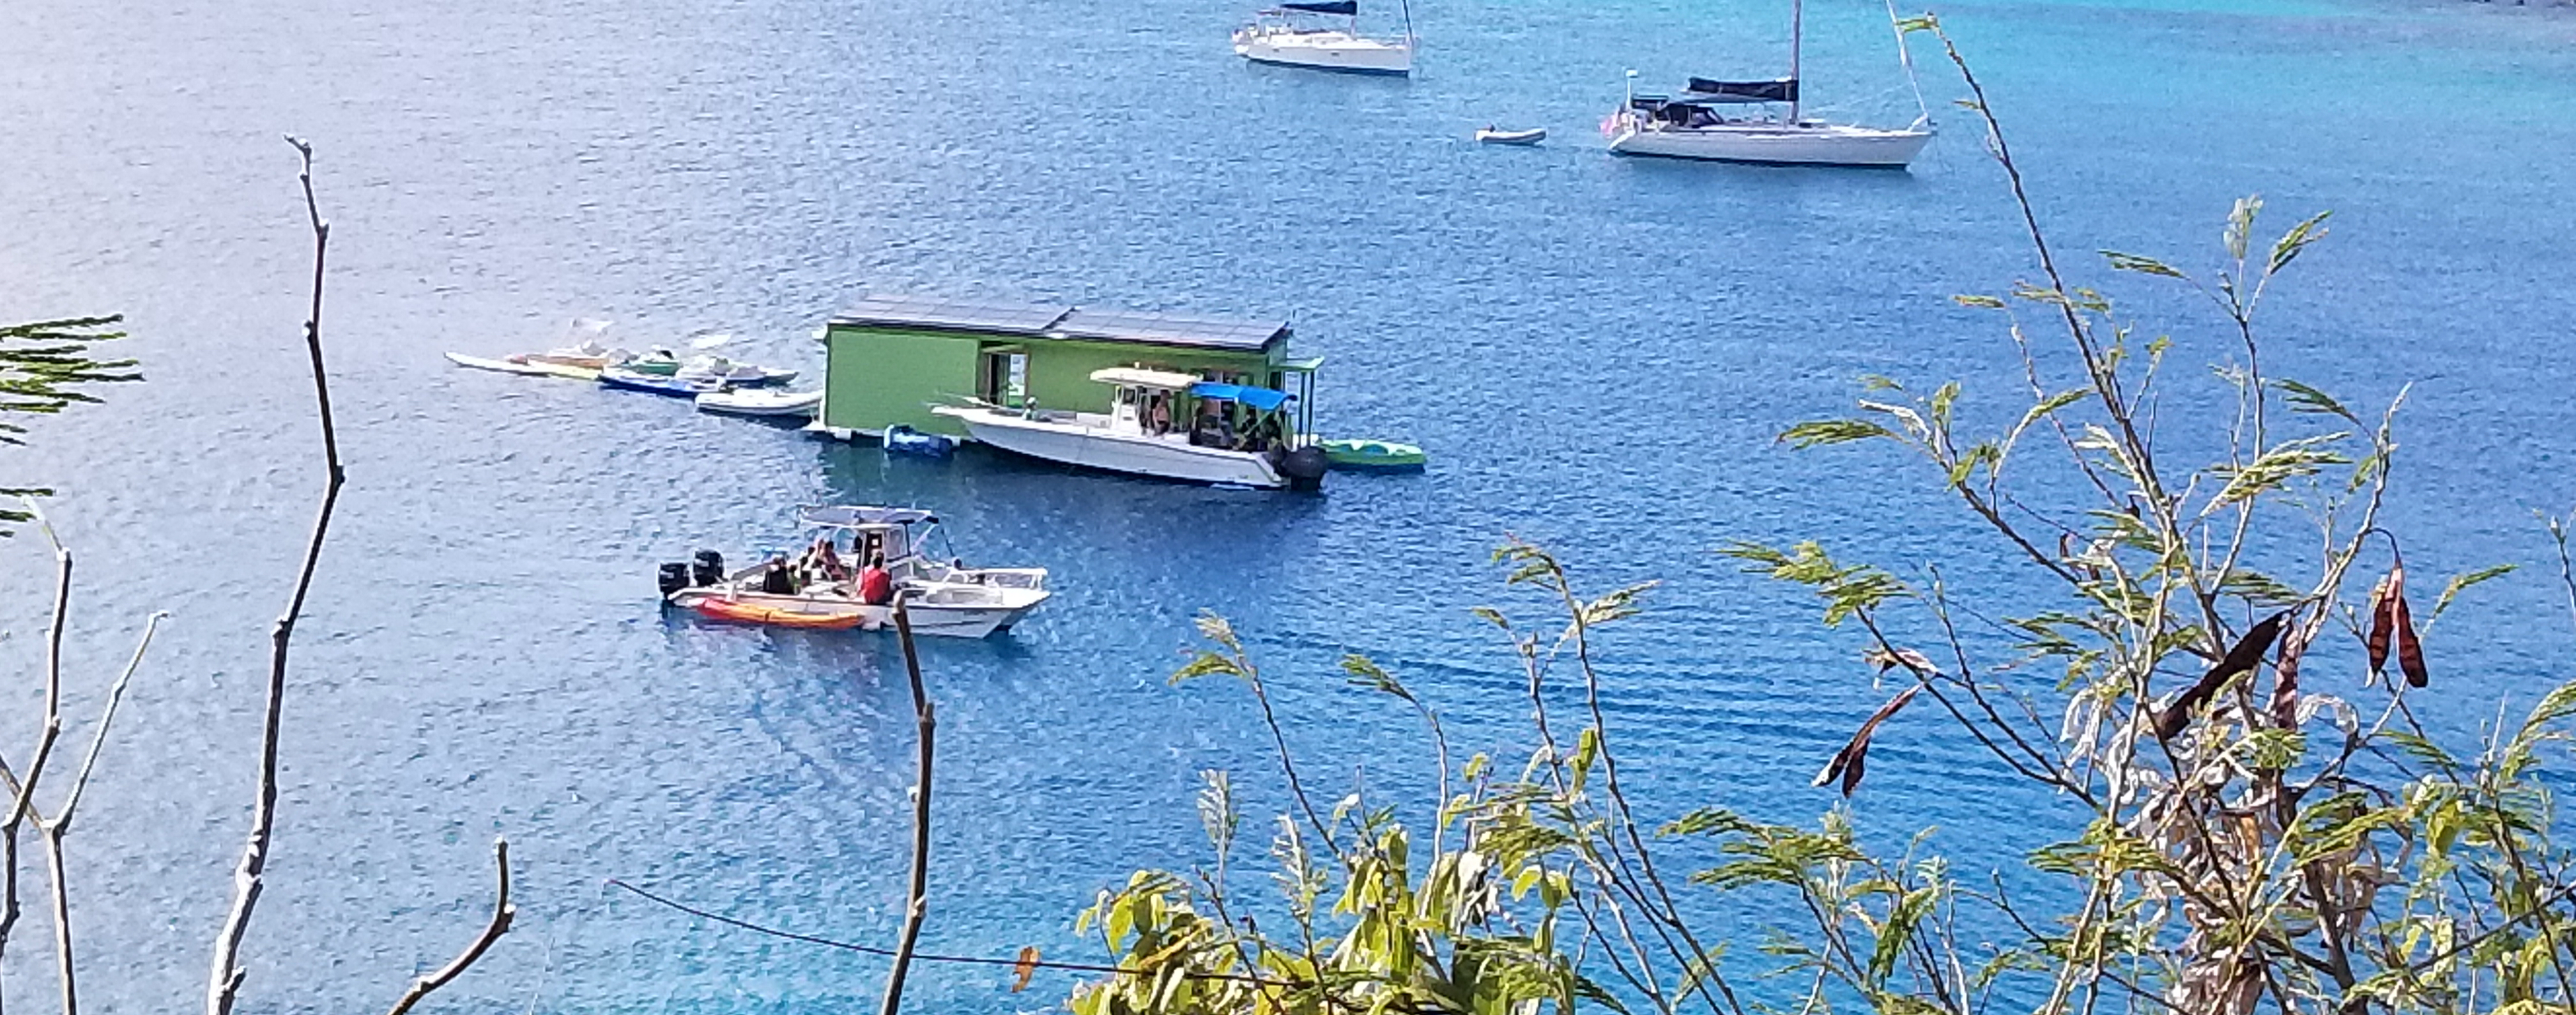 'Floating Food Truck' Opens In Virgin Islands